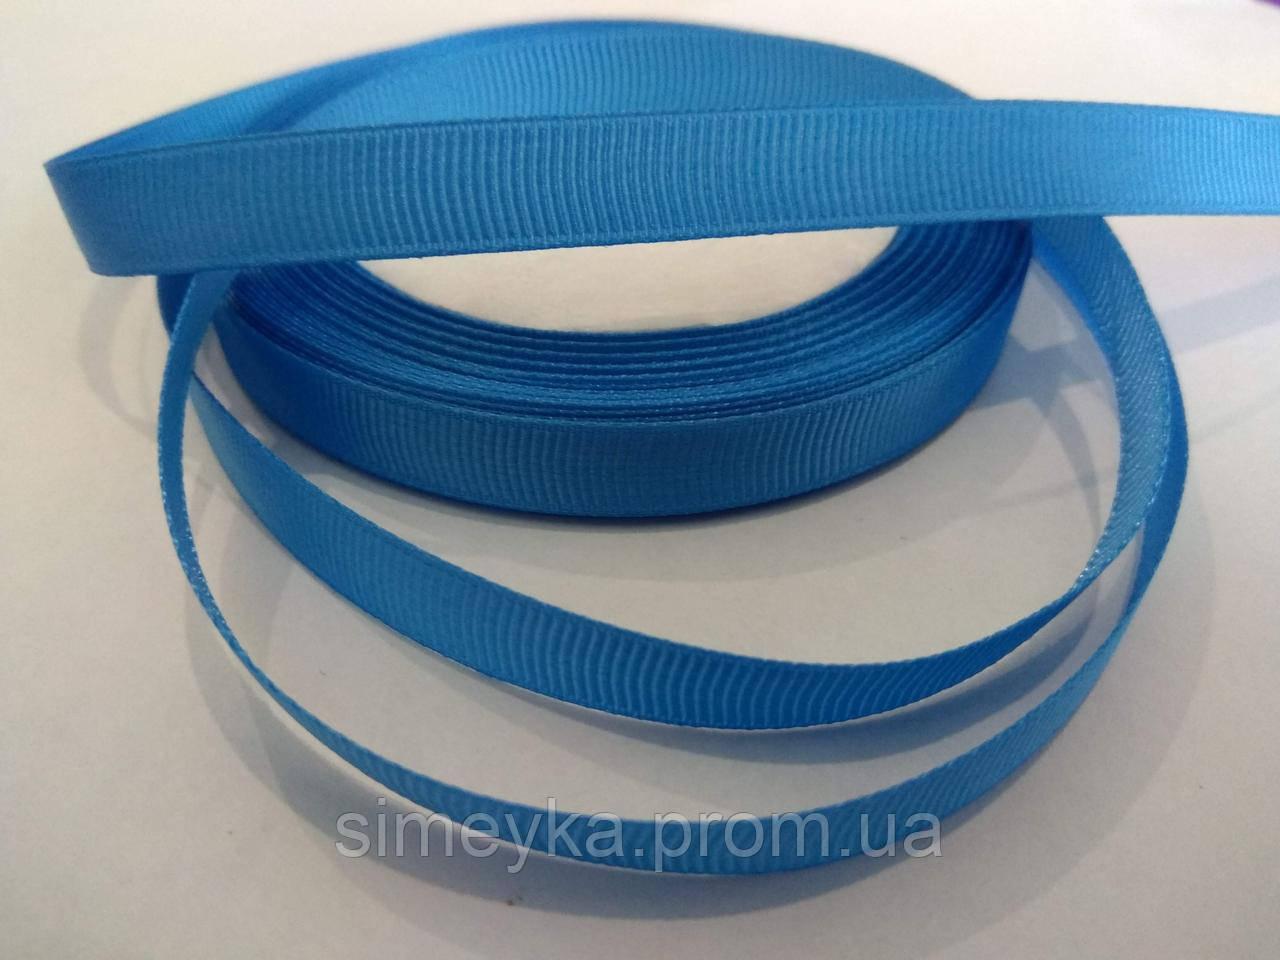 Репс для заколок, ширина 2,5 см, синяя (оттенок: джинс)